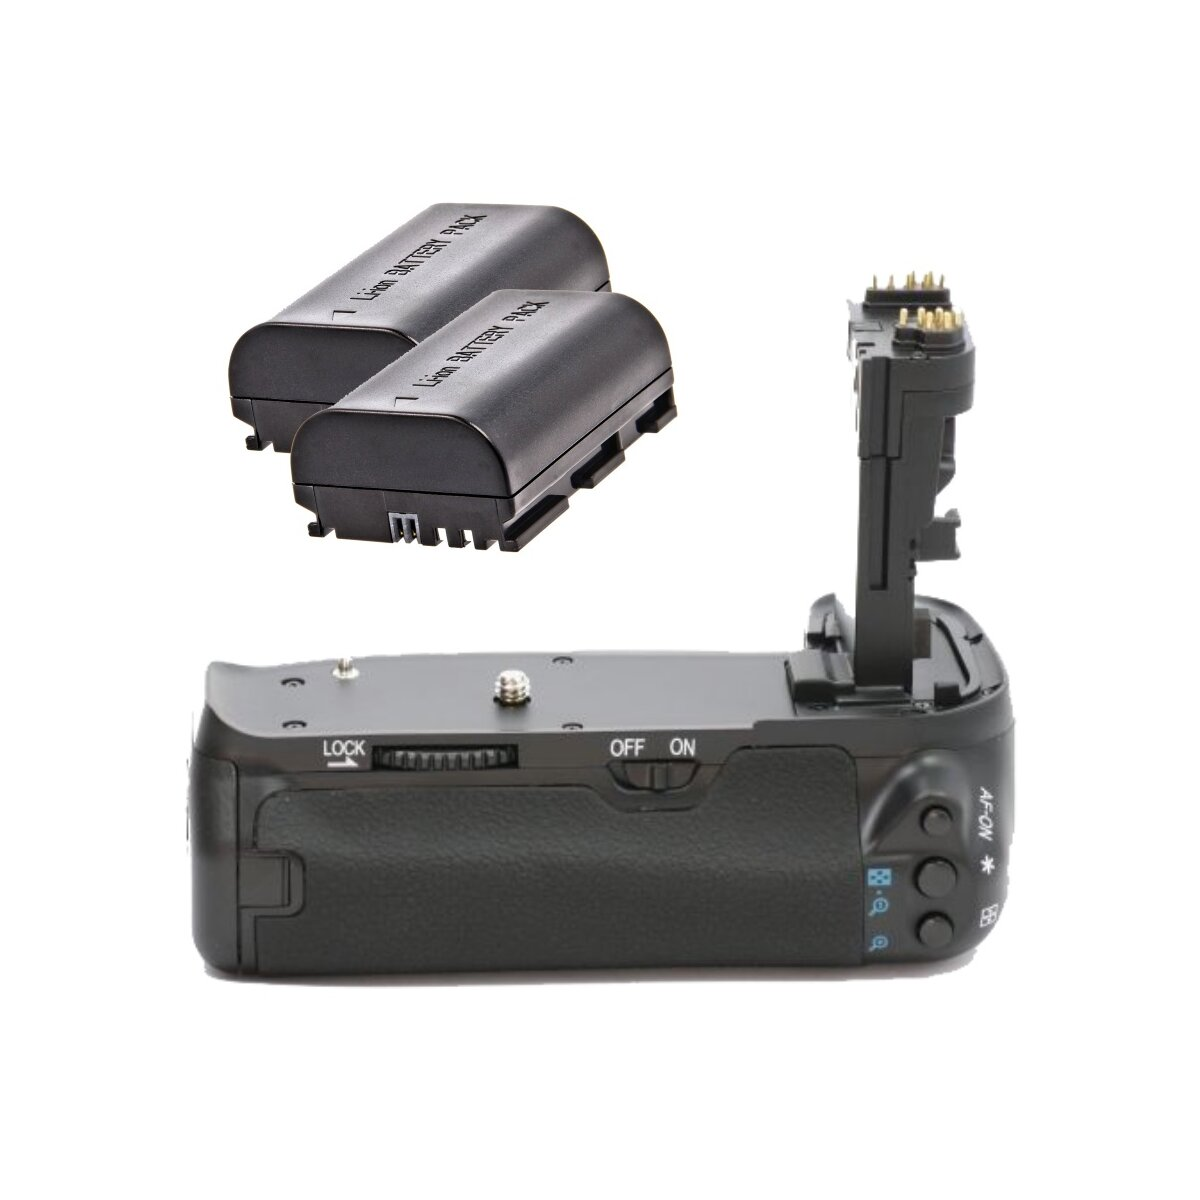 Profi Batteriegriff + 2x Akkus kompatibel mit Canon EOS 60D Ersatz für BG-E9, inkl. 2x Li-Ion Akku Ersatz für LP-E6